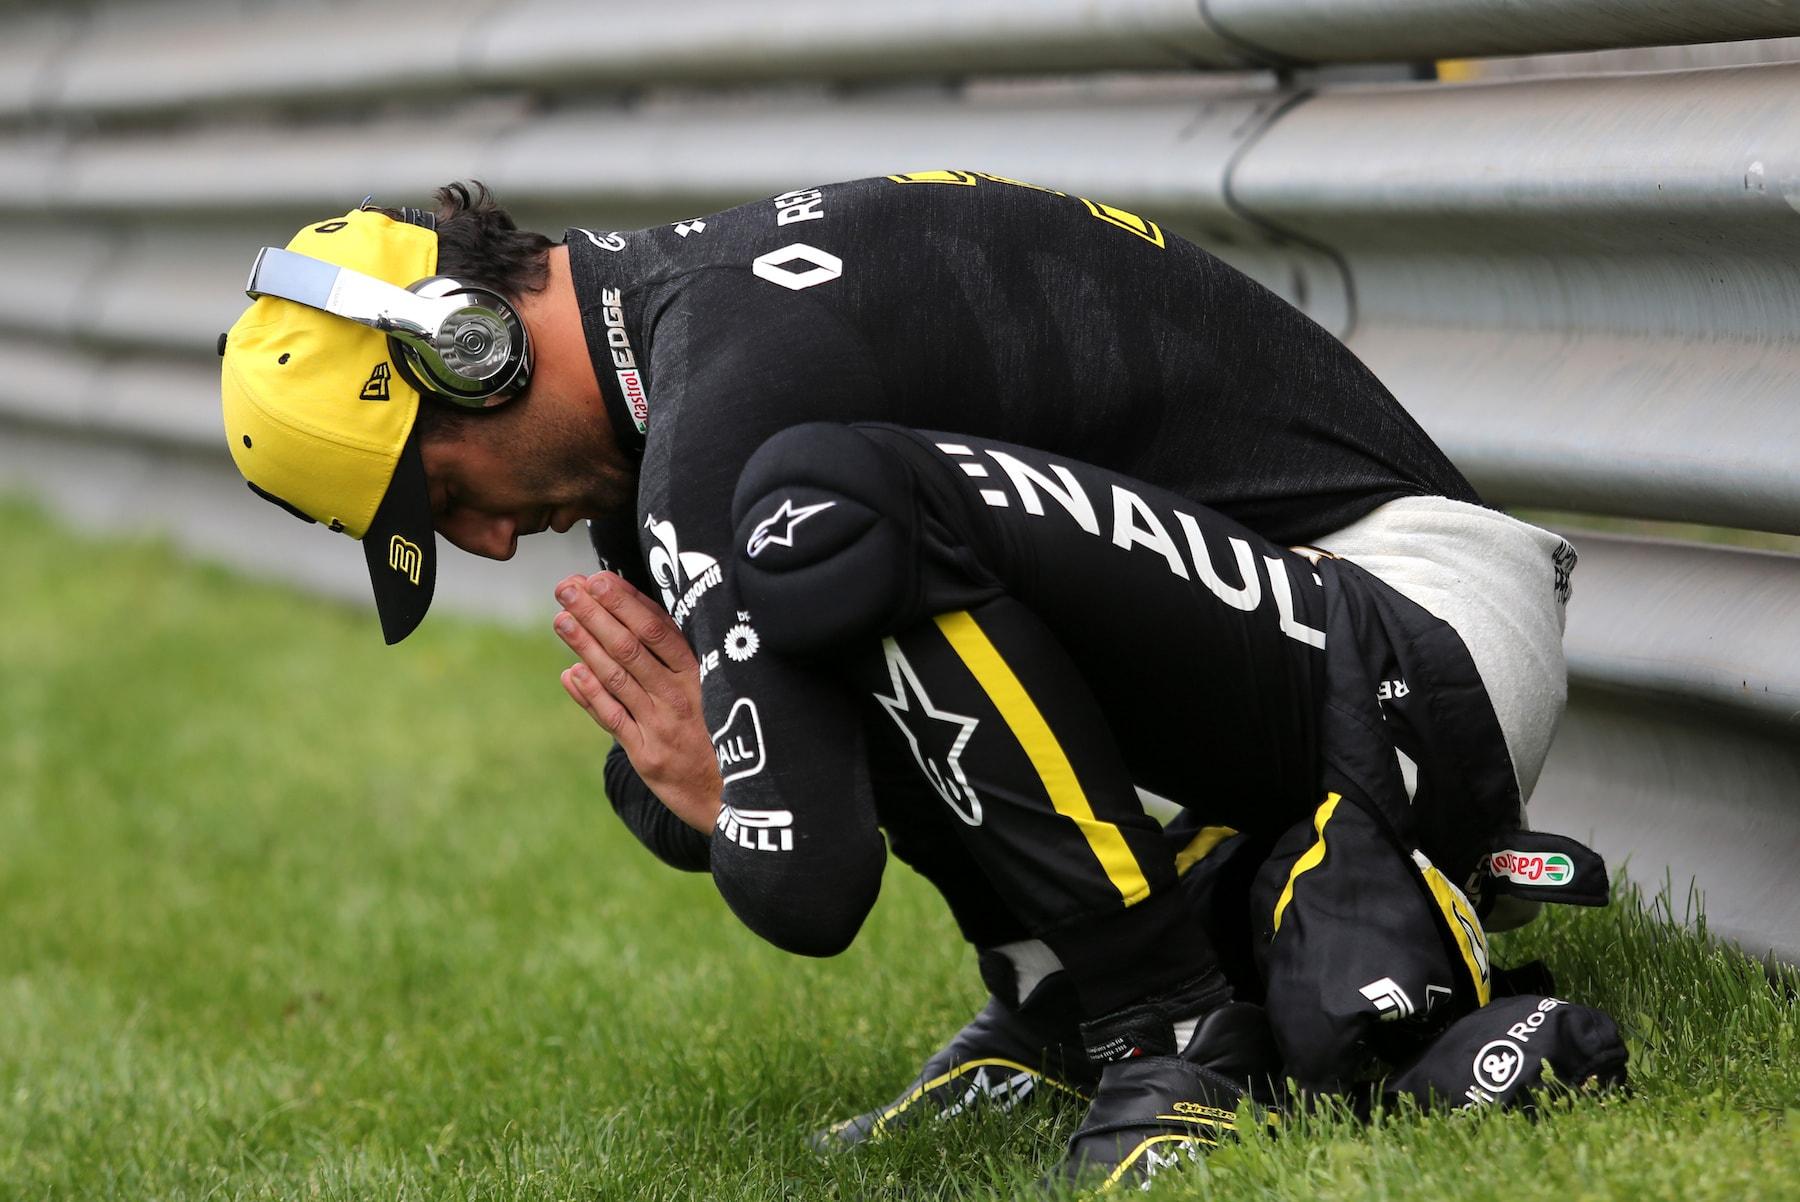 3 2019 Daniel Ricciardo | Renault RS19 | 2019 Chinese GP 1 copy.jpg